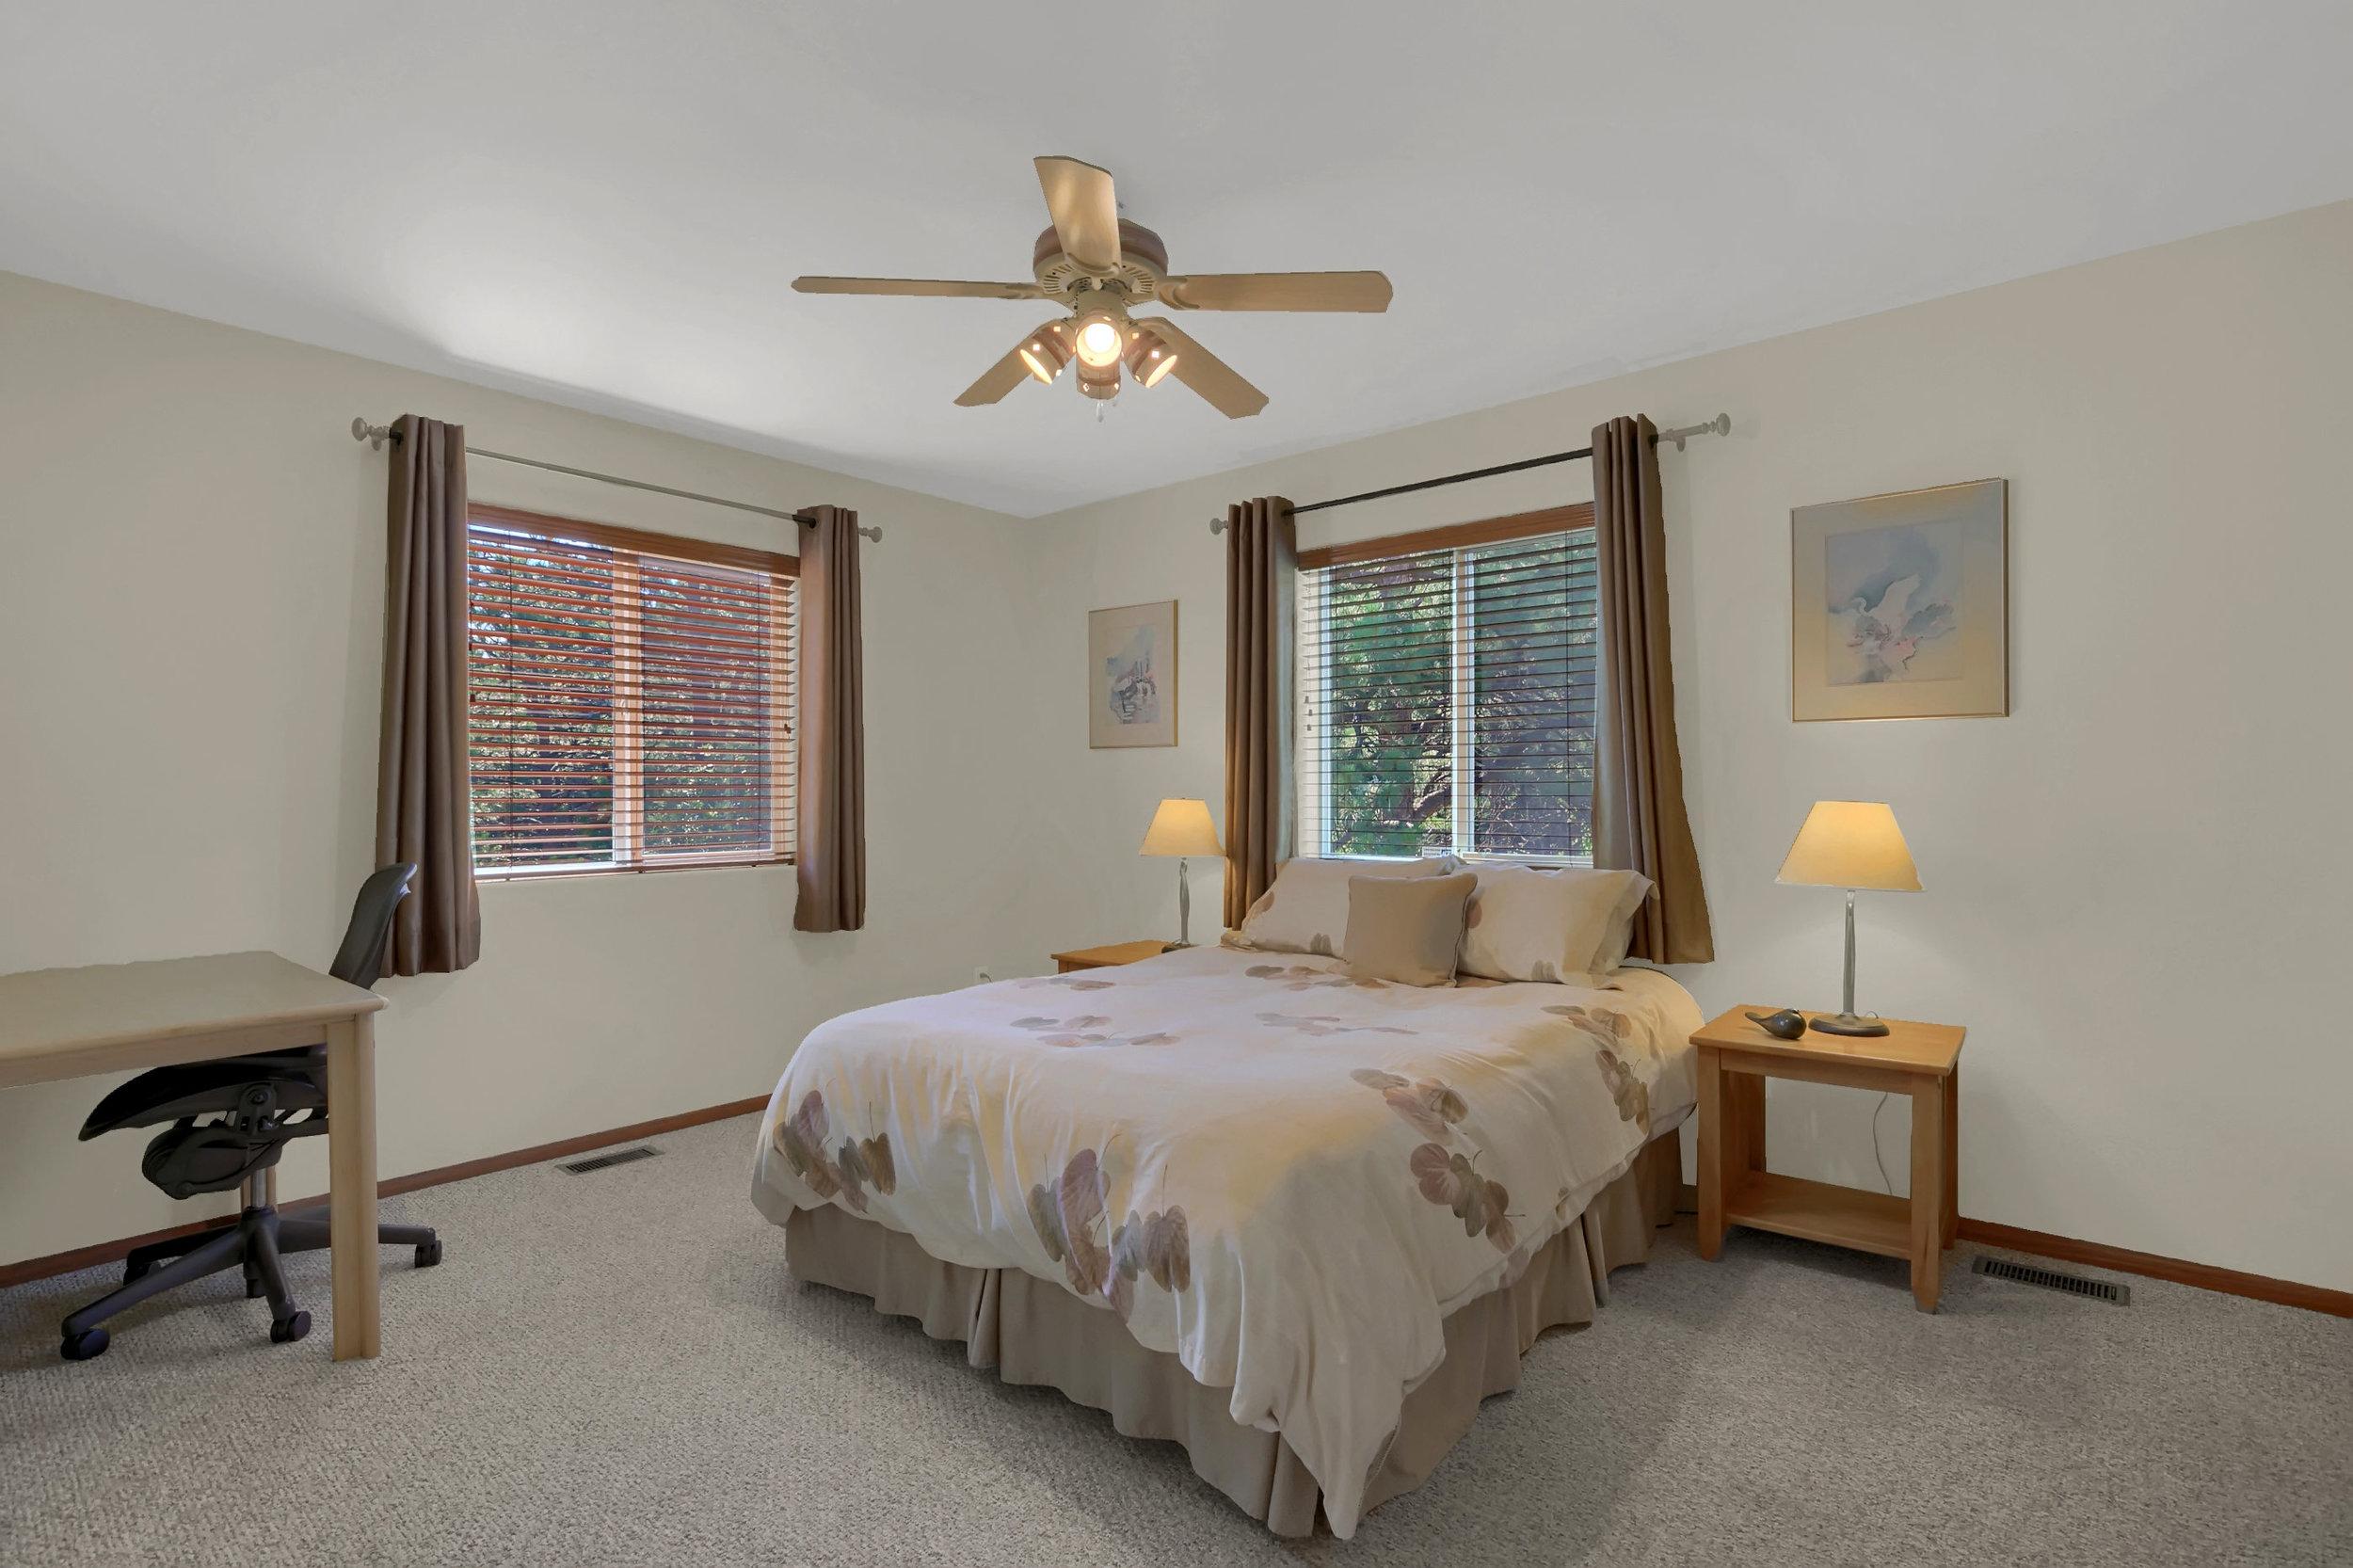 1605 Vickers Drive Colorado-print-022-011-Bedroom-2799x1865-300dpi.jpg